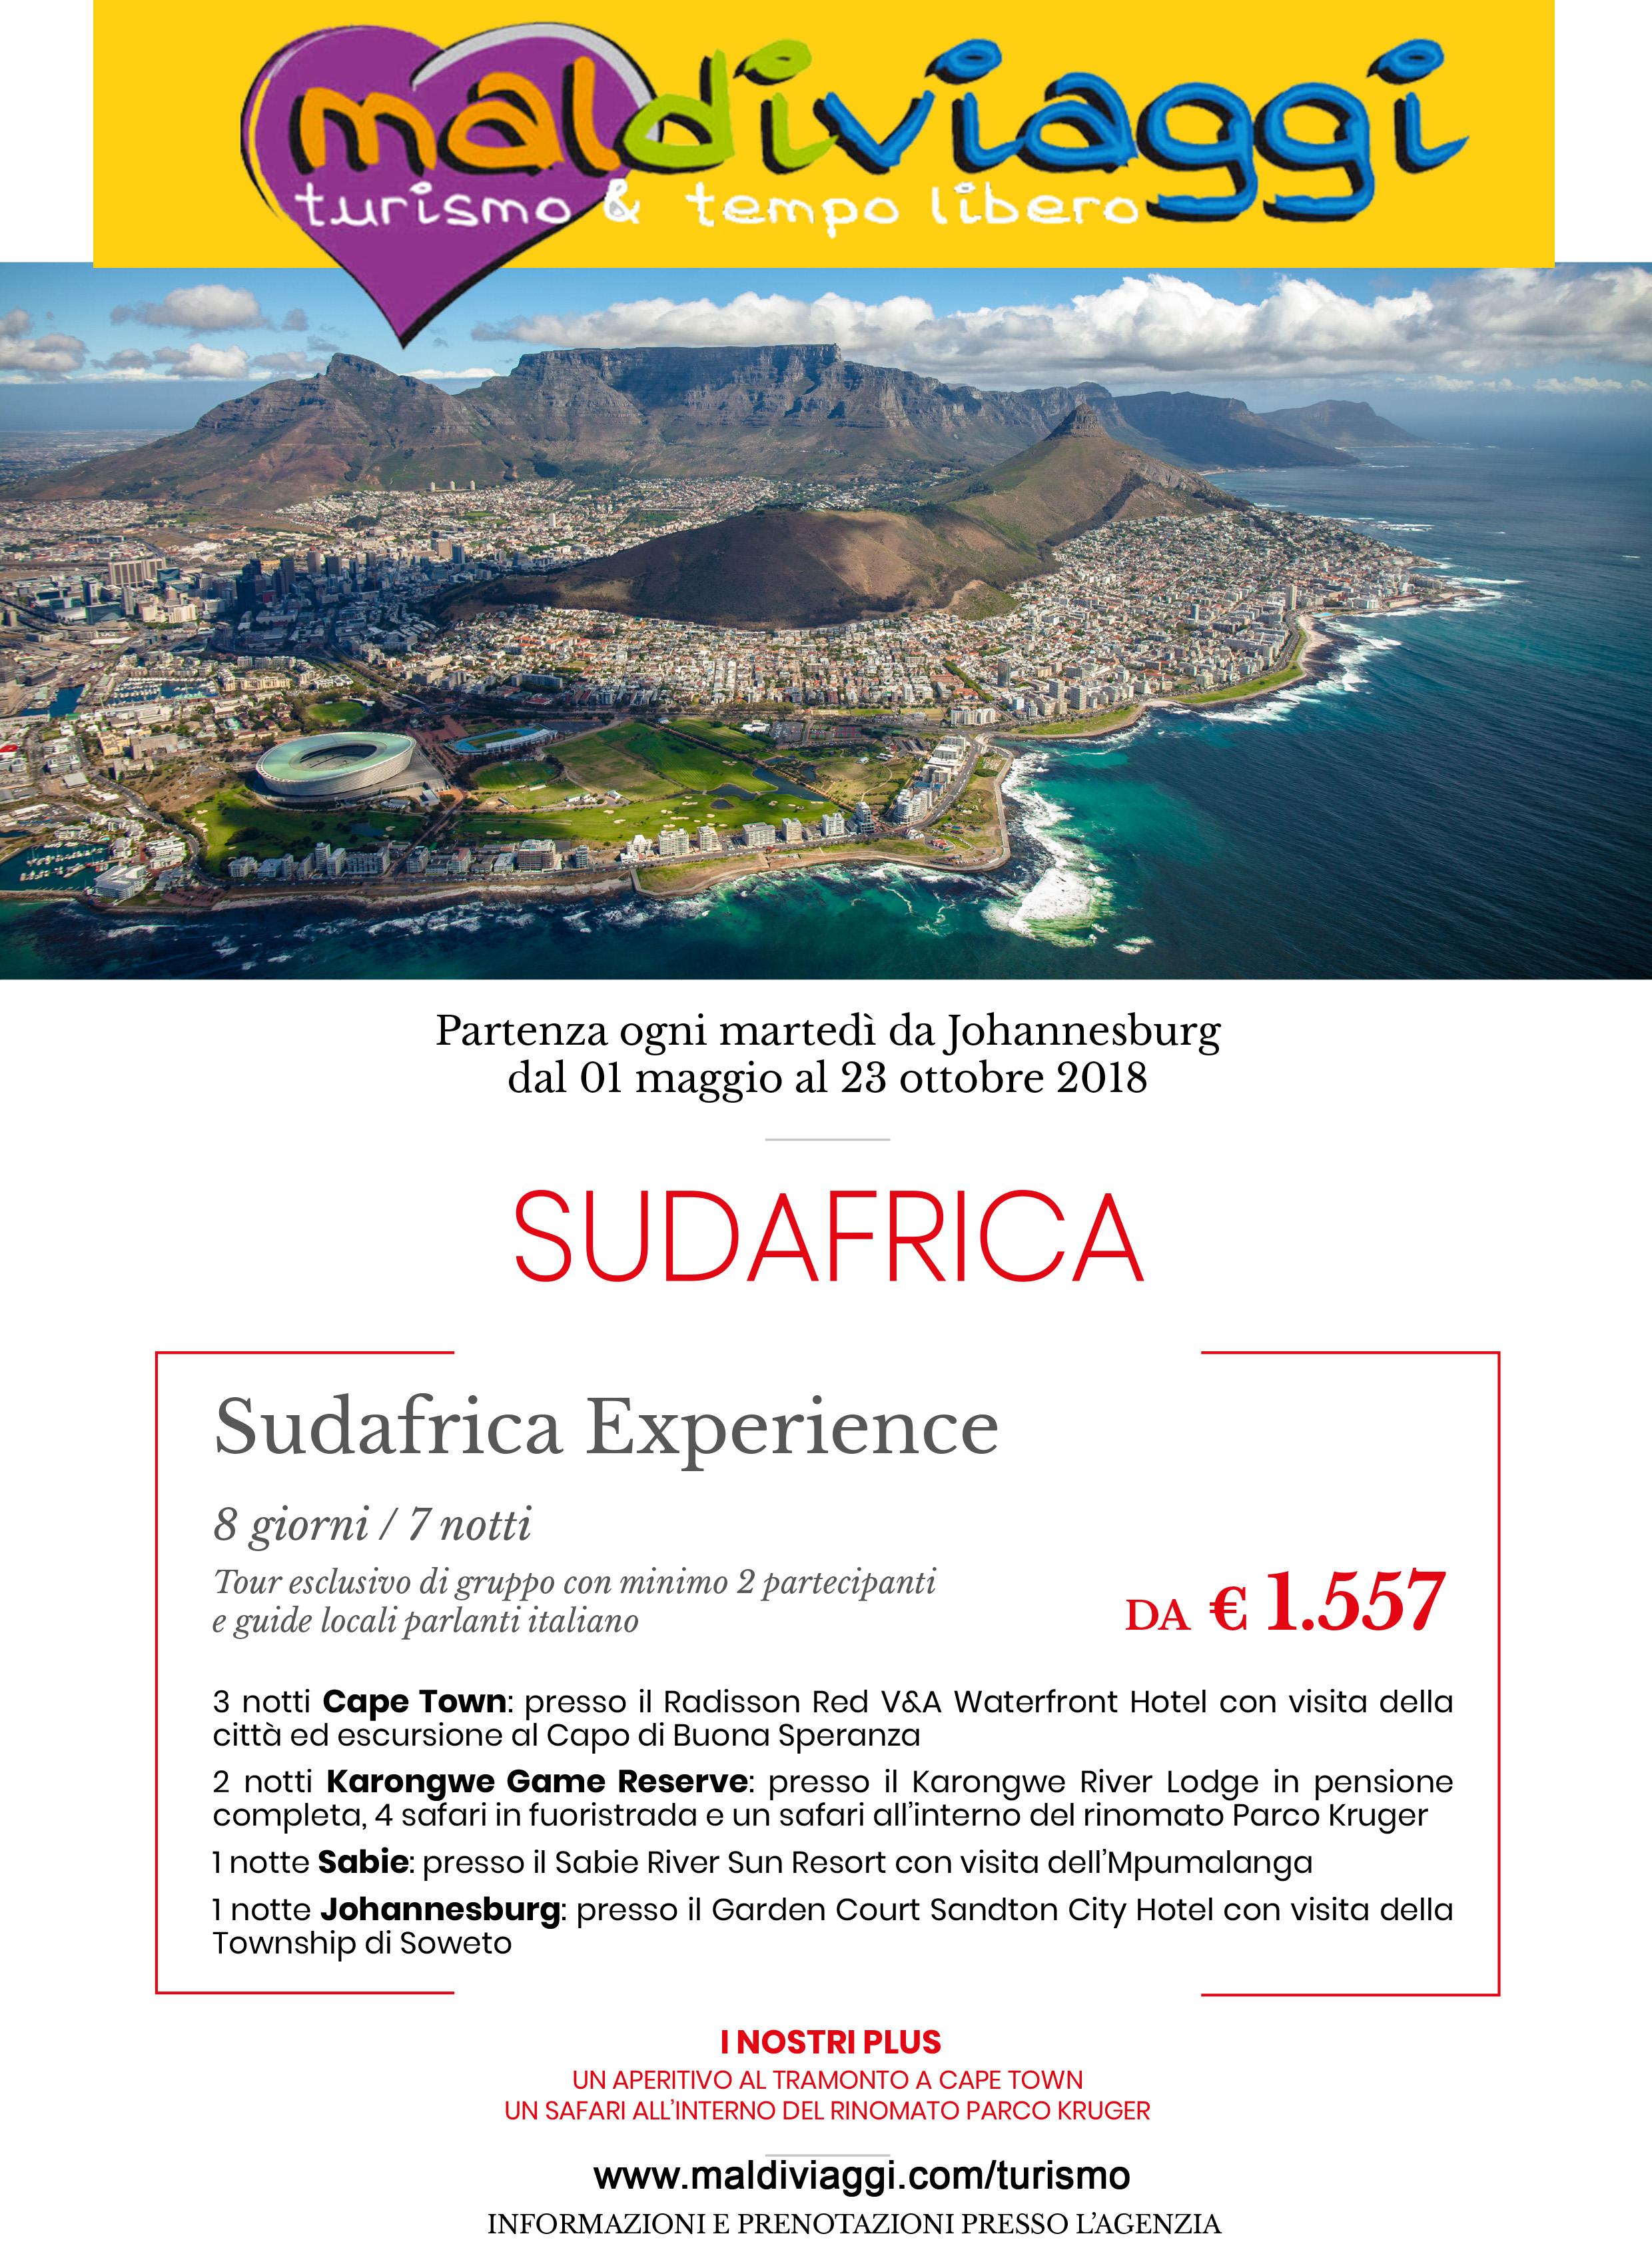 Sudafrica experience